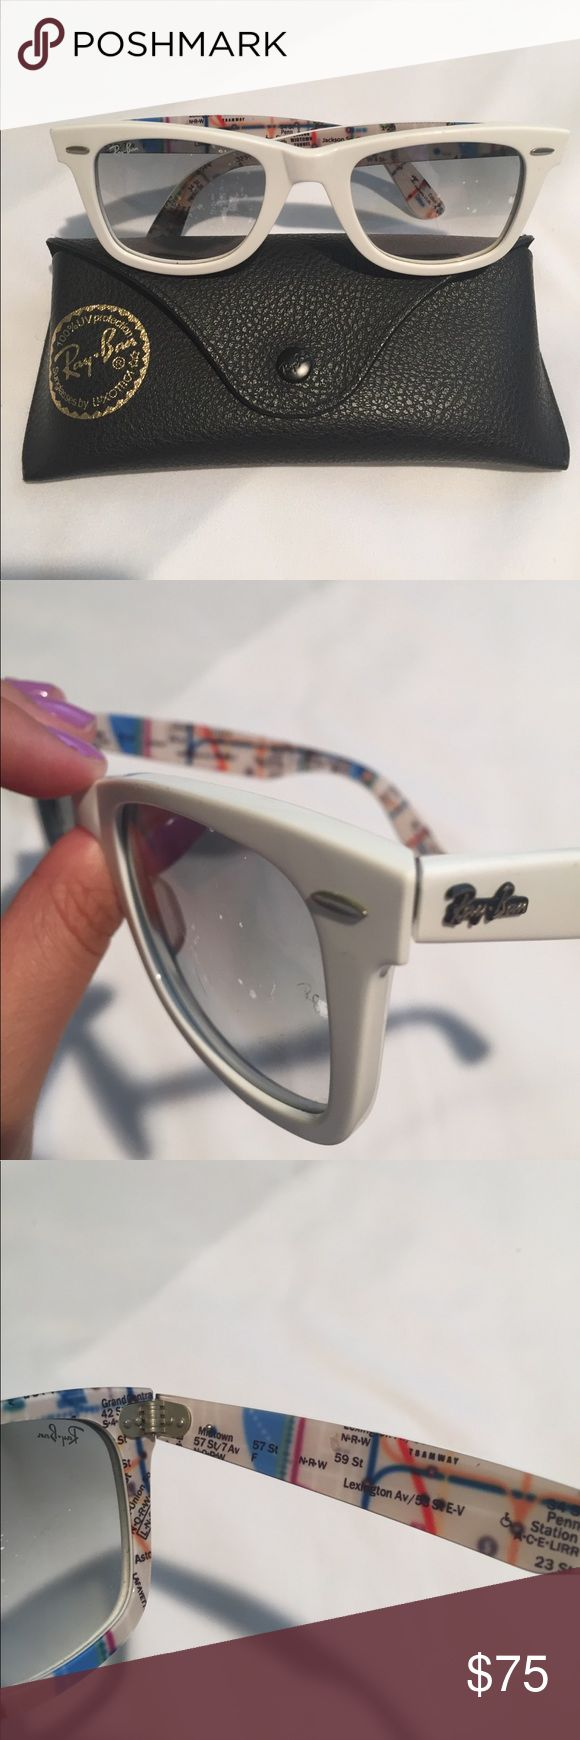 white ray bans limited edition new york city subway map wayfarer Ray-Ban Accessories Sunglasses